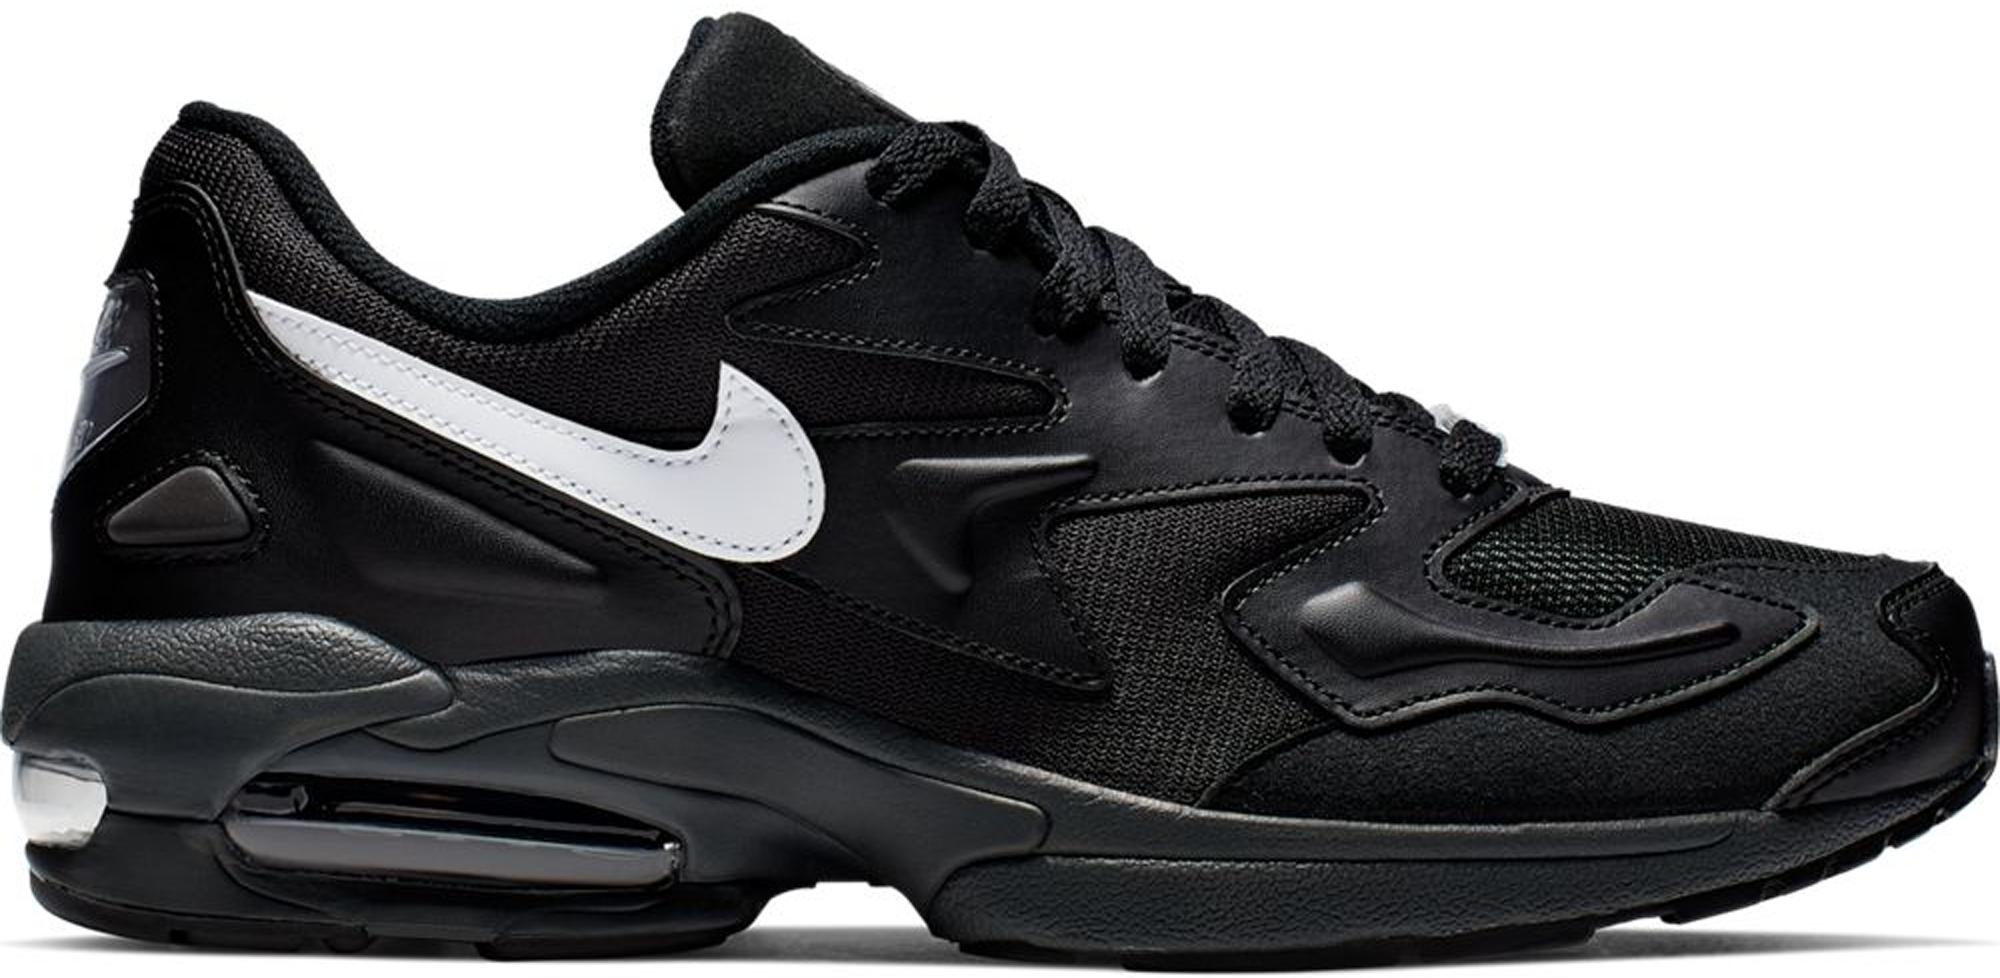 Nike Air Max 2 Light Black White